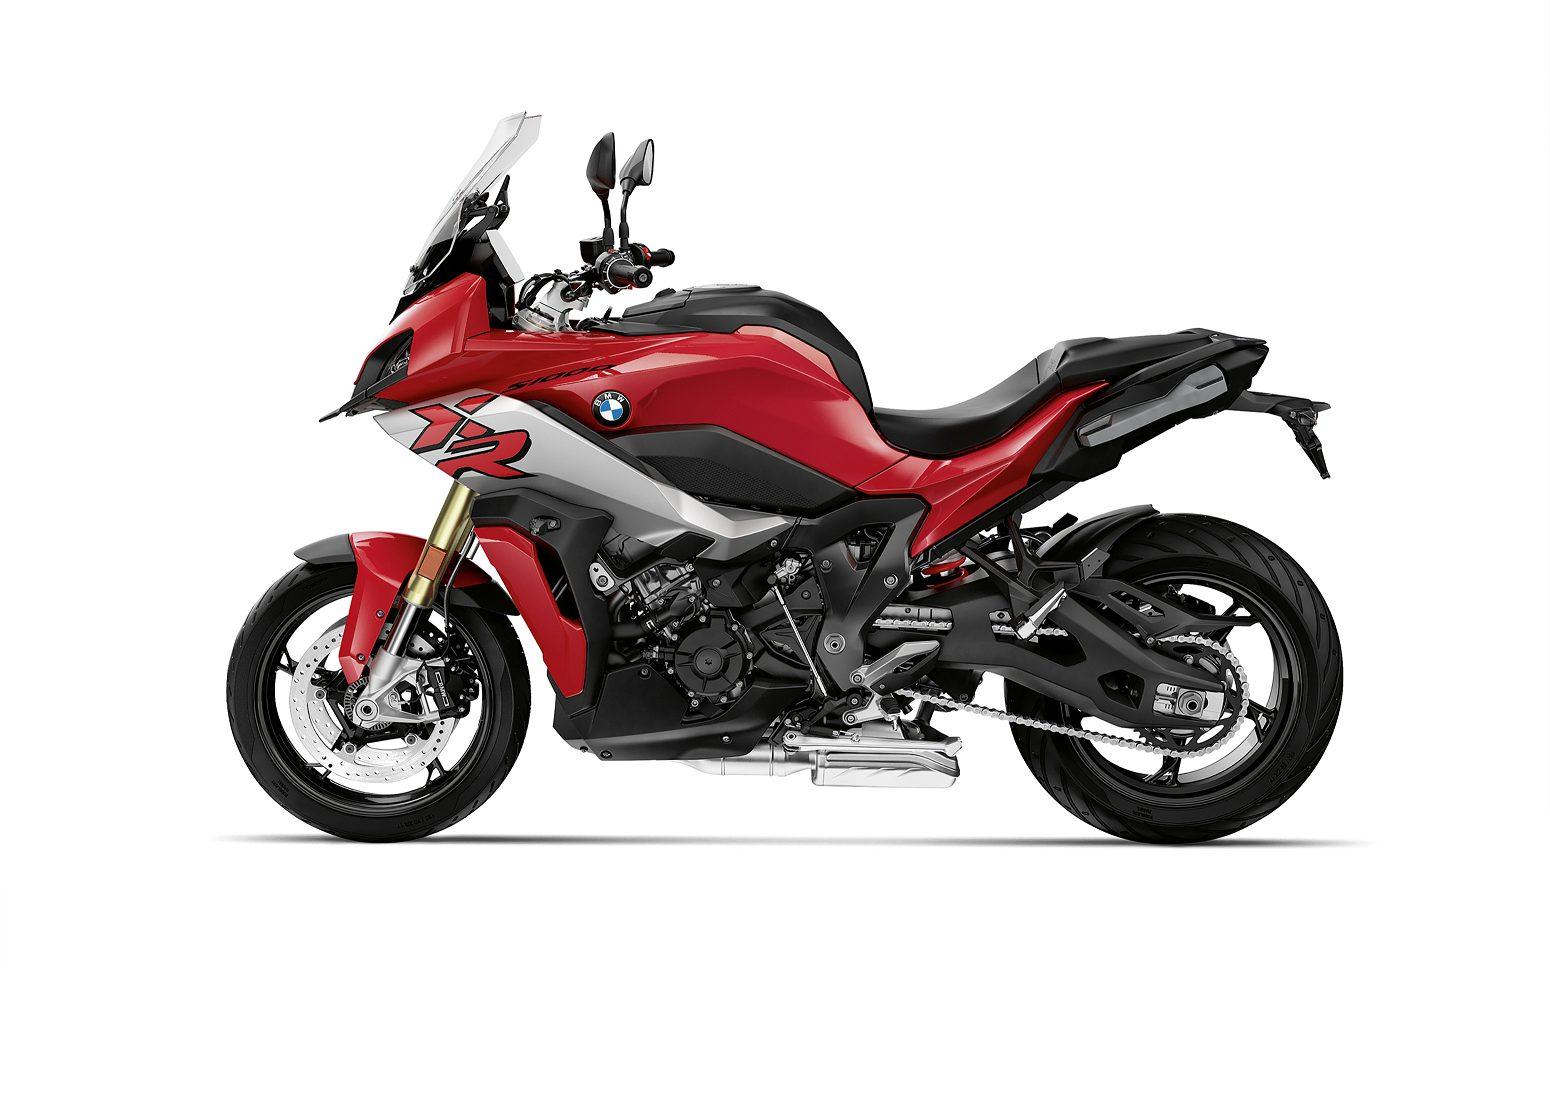 2021-BMW-S-1000-XR-Red-White-Left